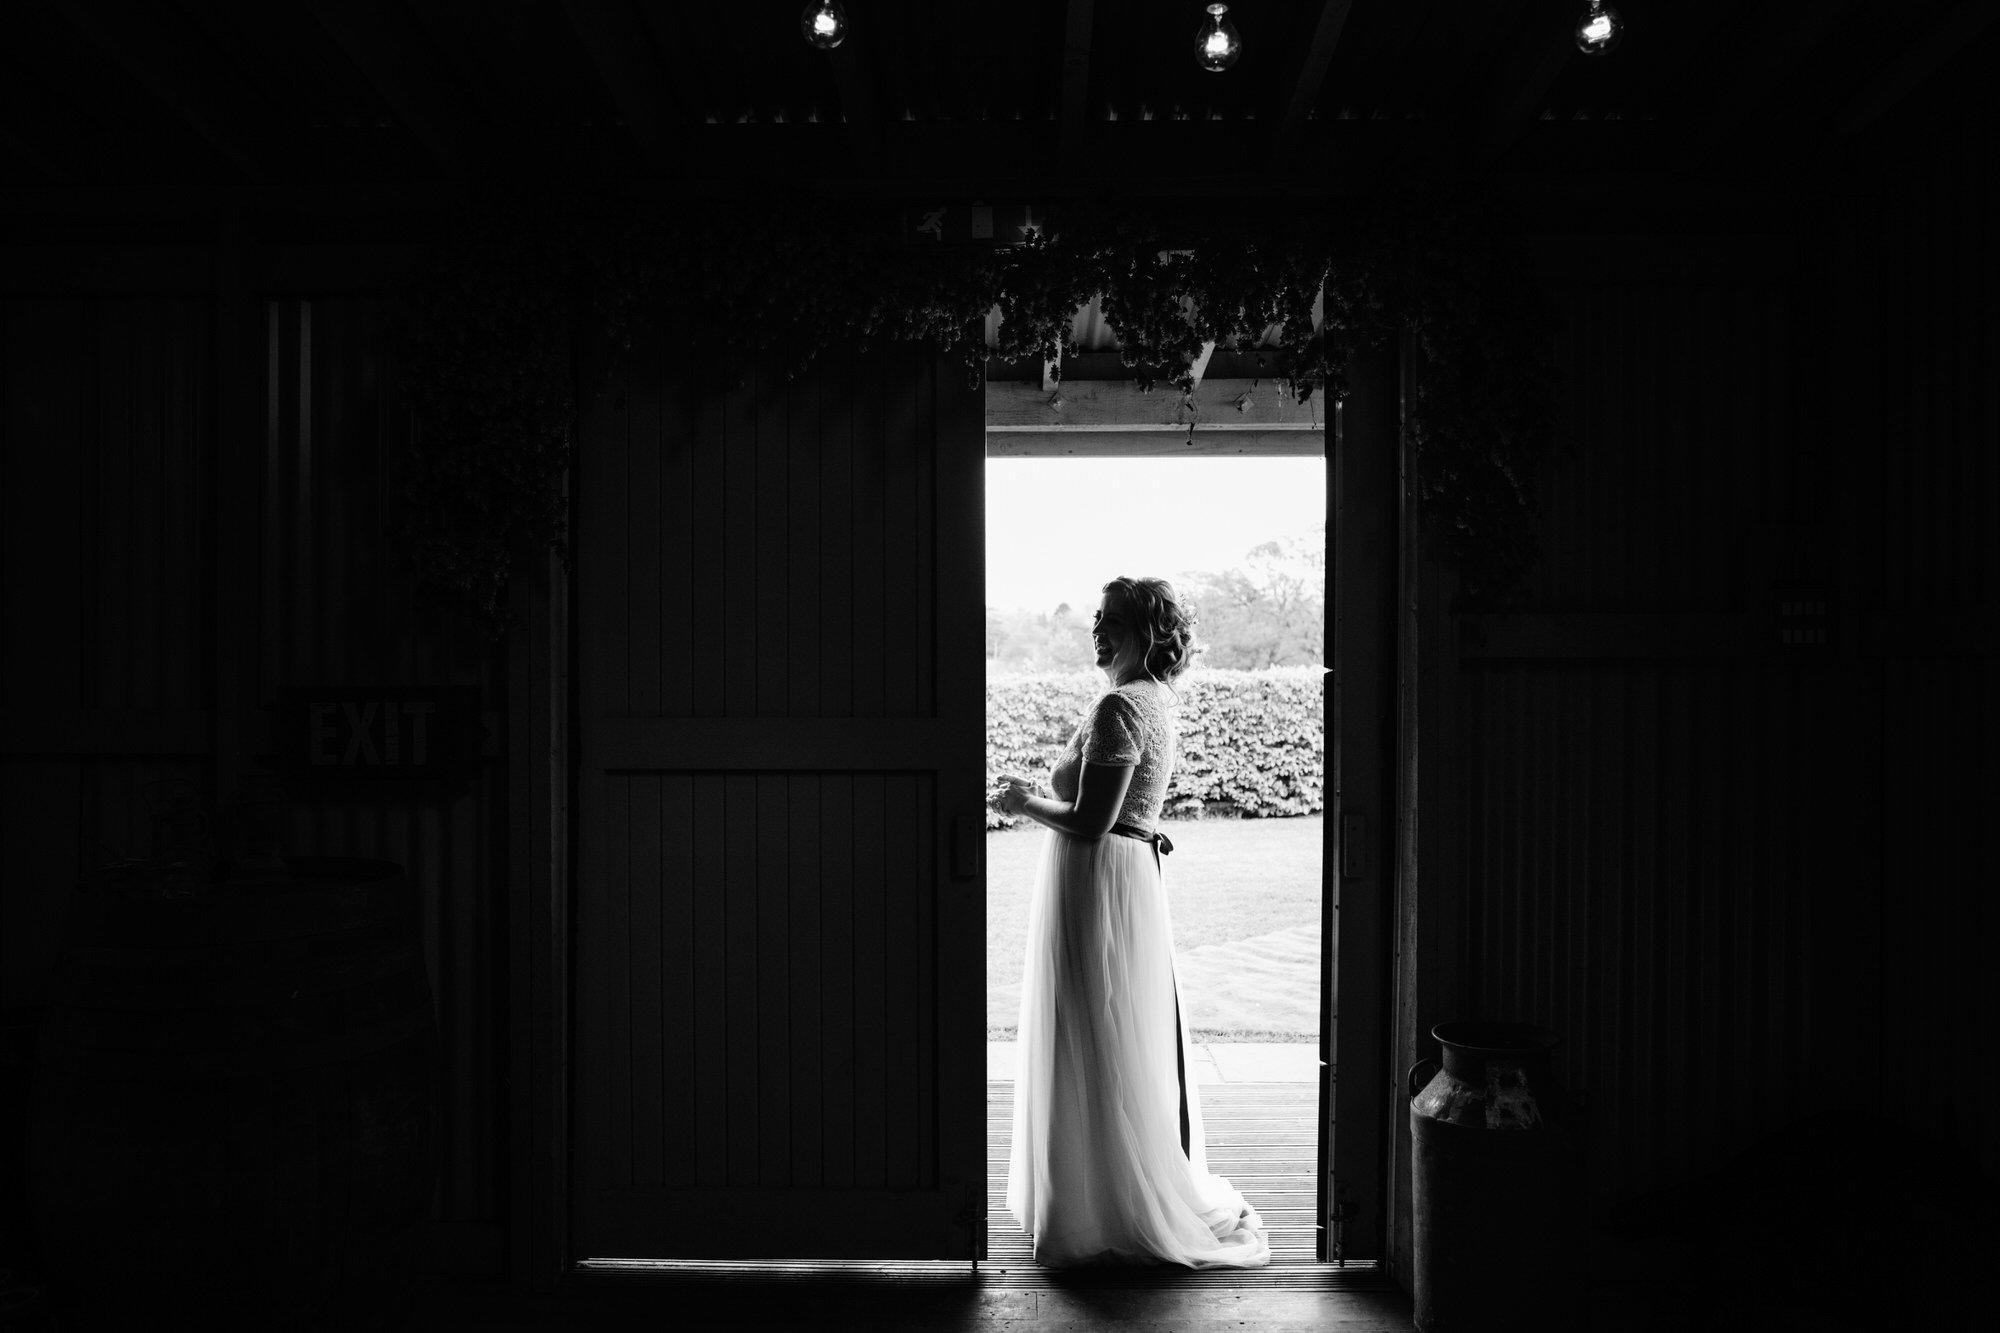 042 TIN SHED KNOCKRAICH WEDDING AUSTRIAN SCOTTISH ZOE ALEXANDRA PHOTOGRAPHY